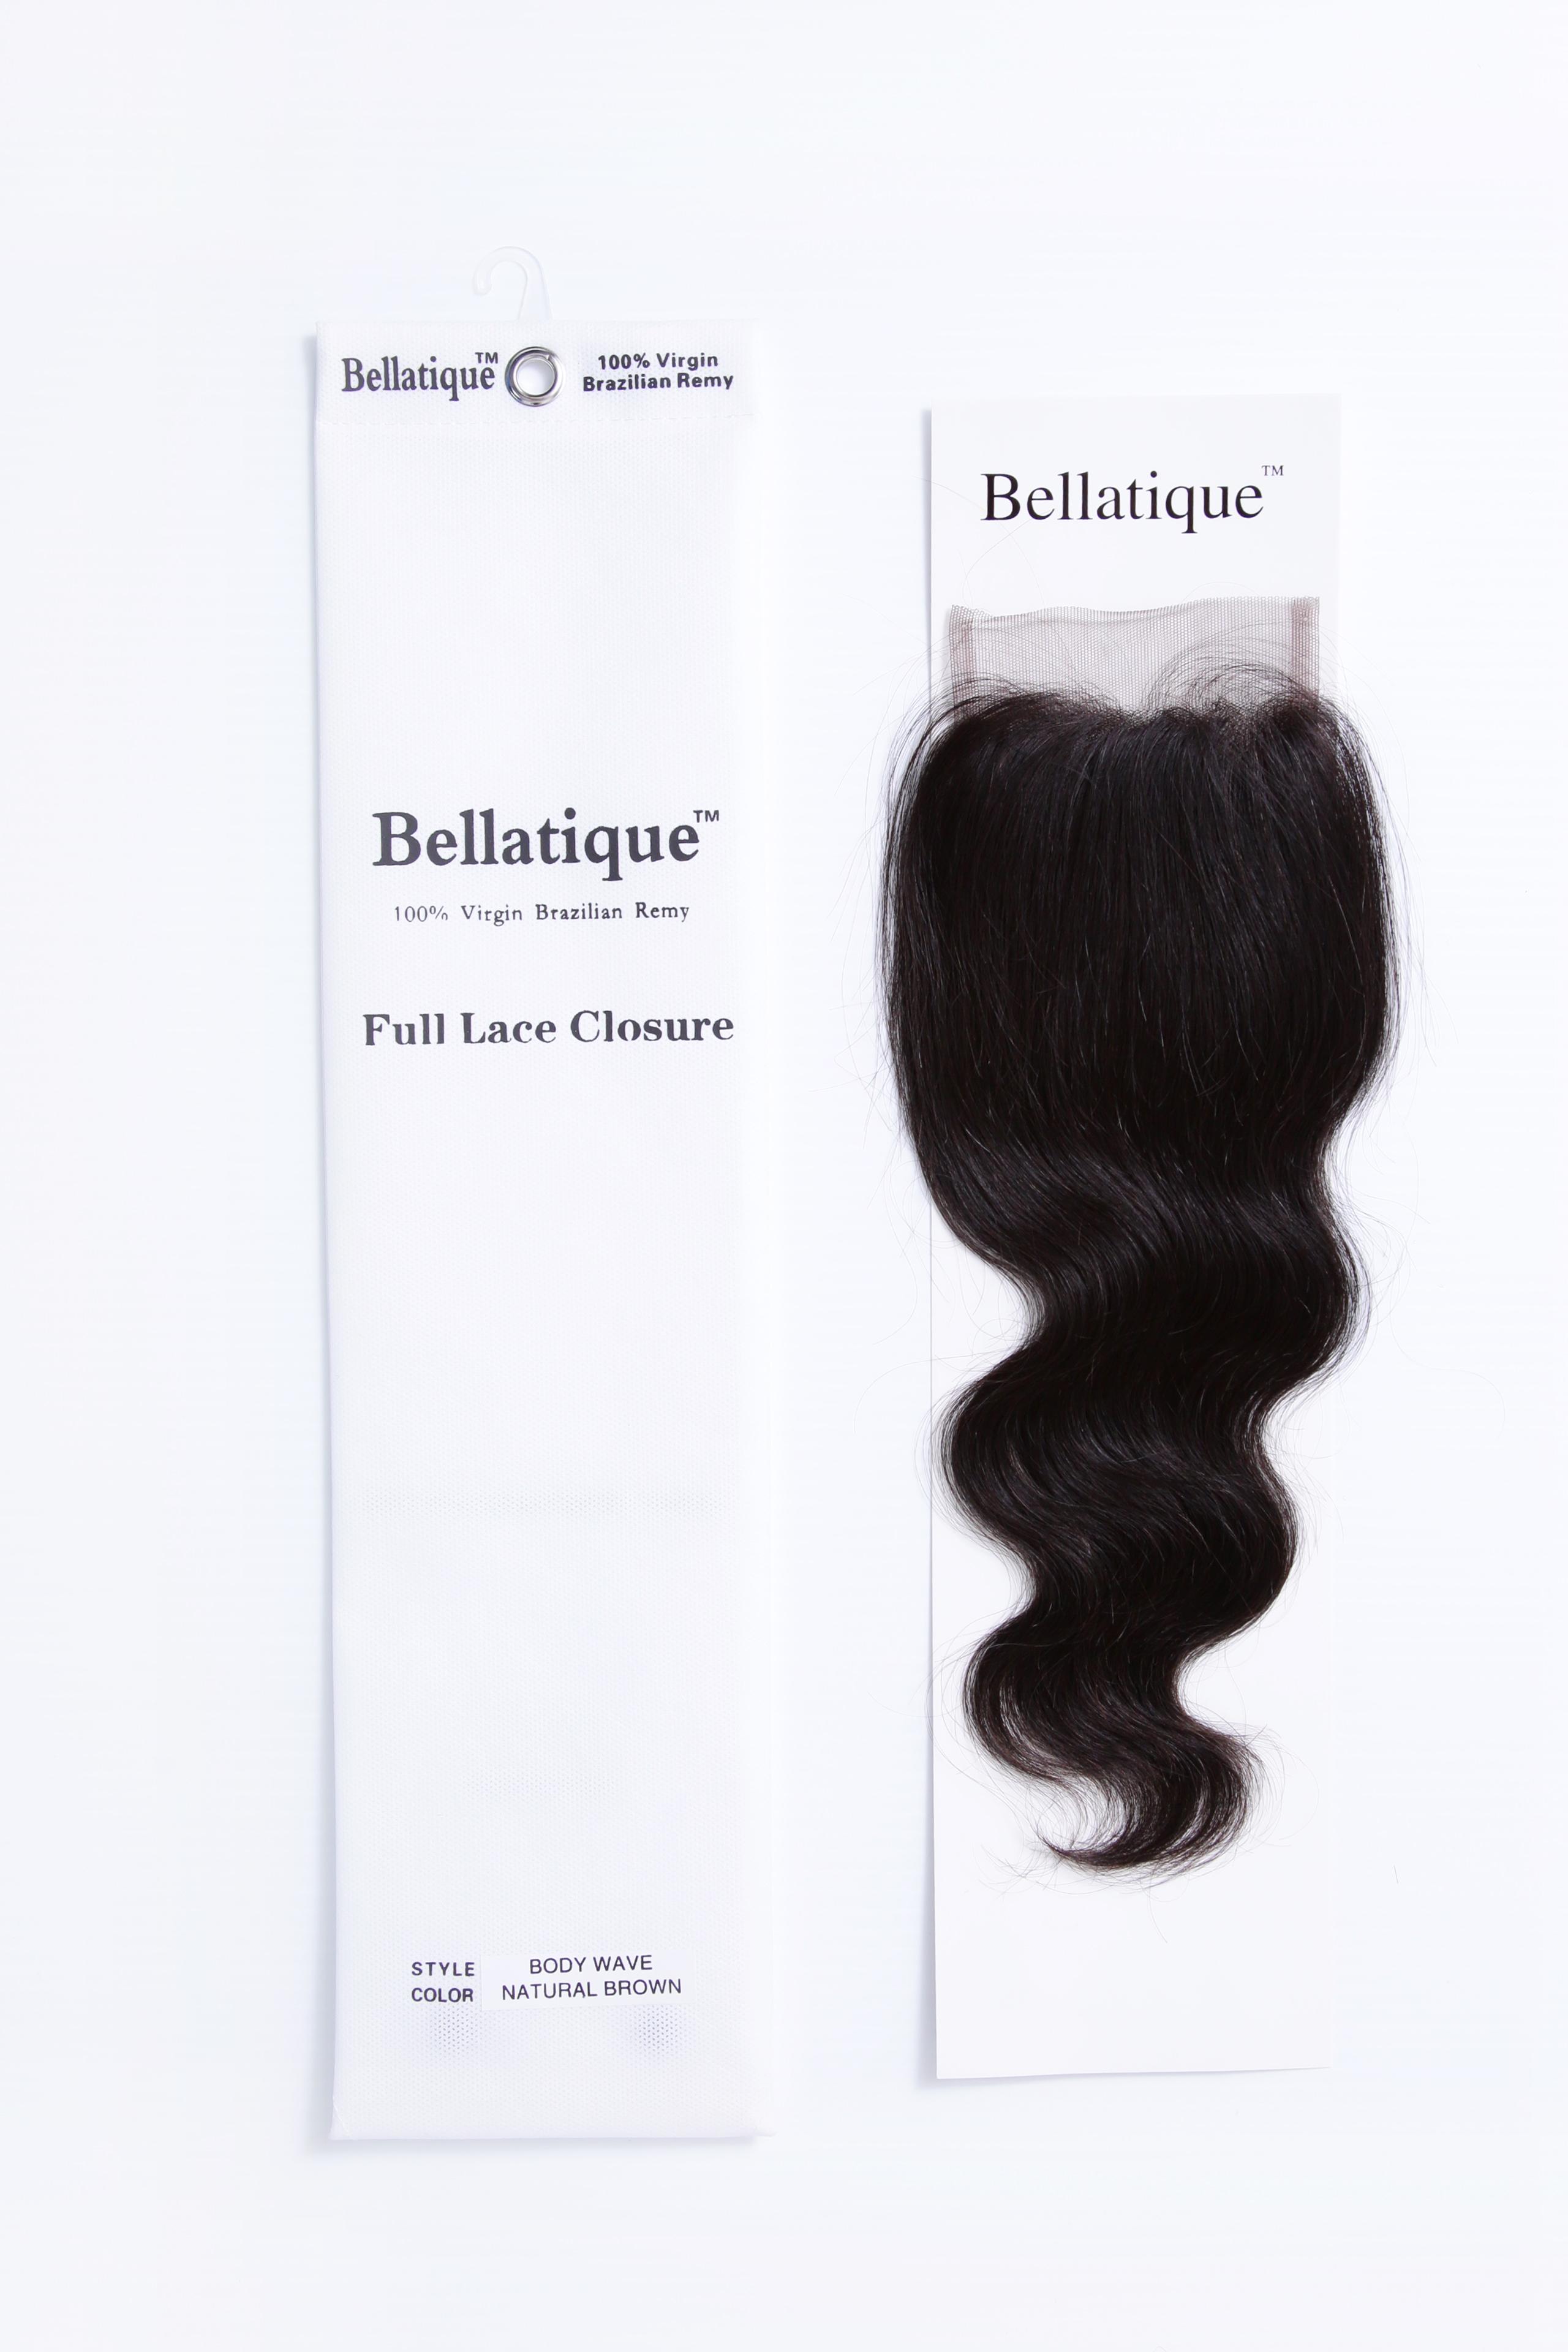 Bellatique 9a Full Lace Closure 4 X 4 Boday Wave 100